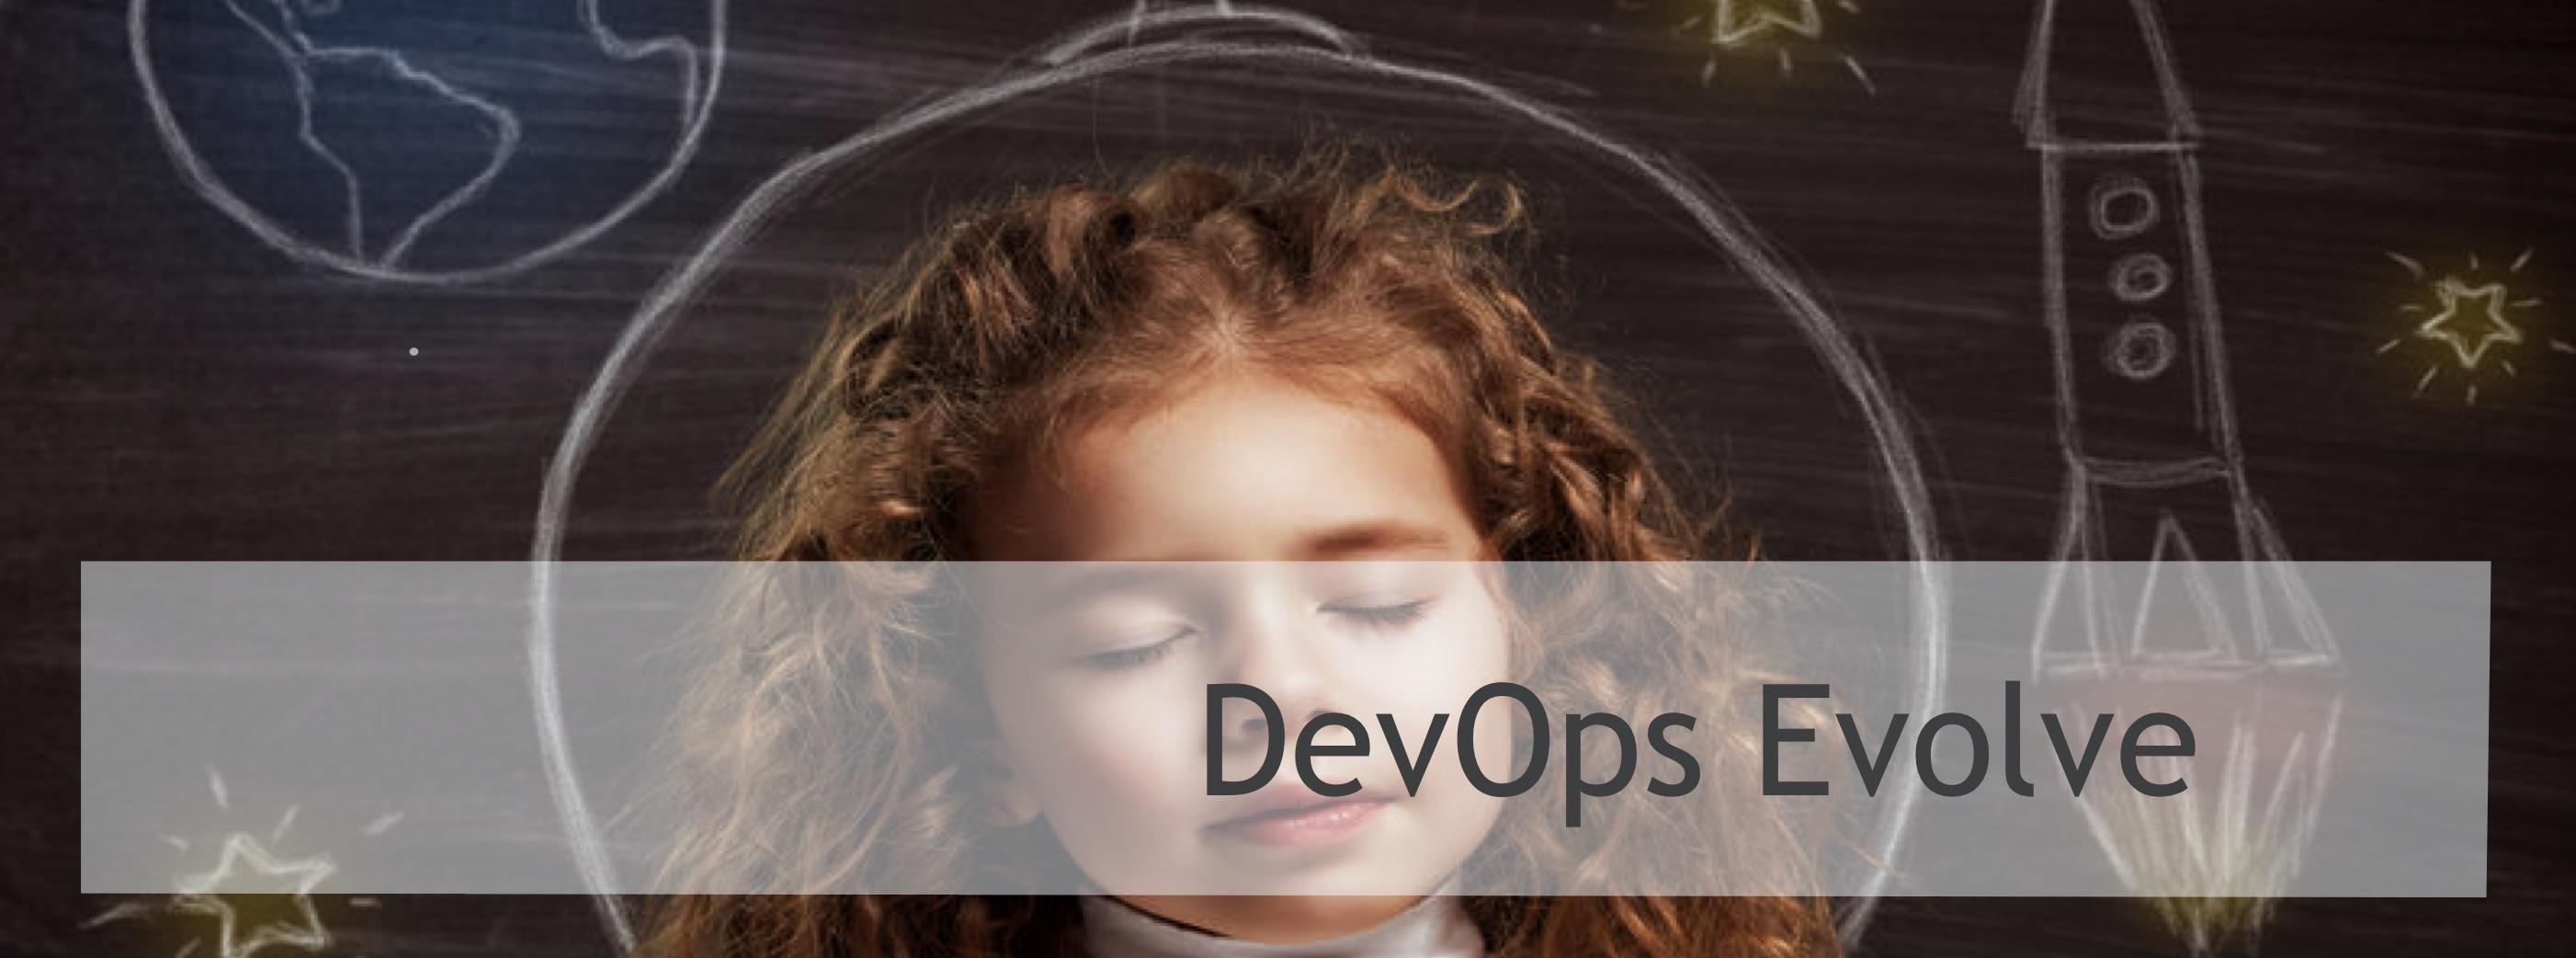 DevOps Evolve.jpg